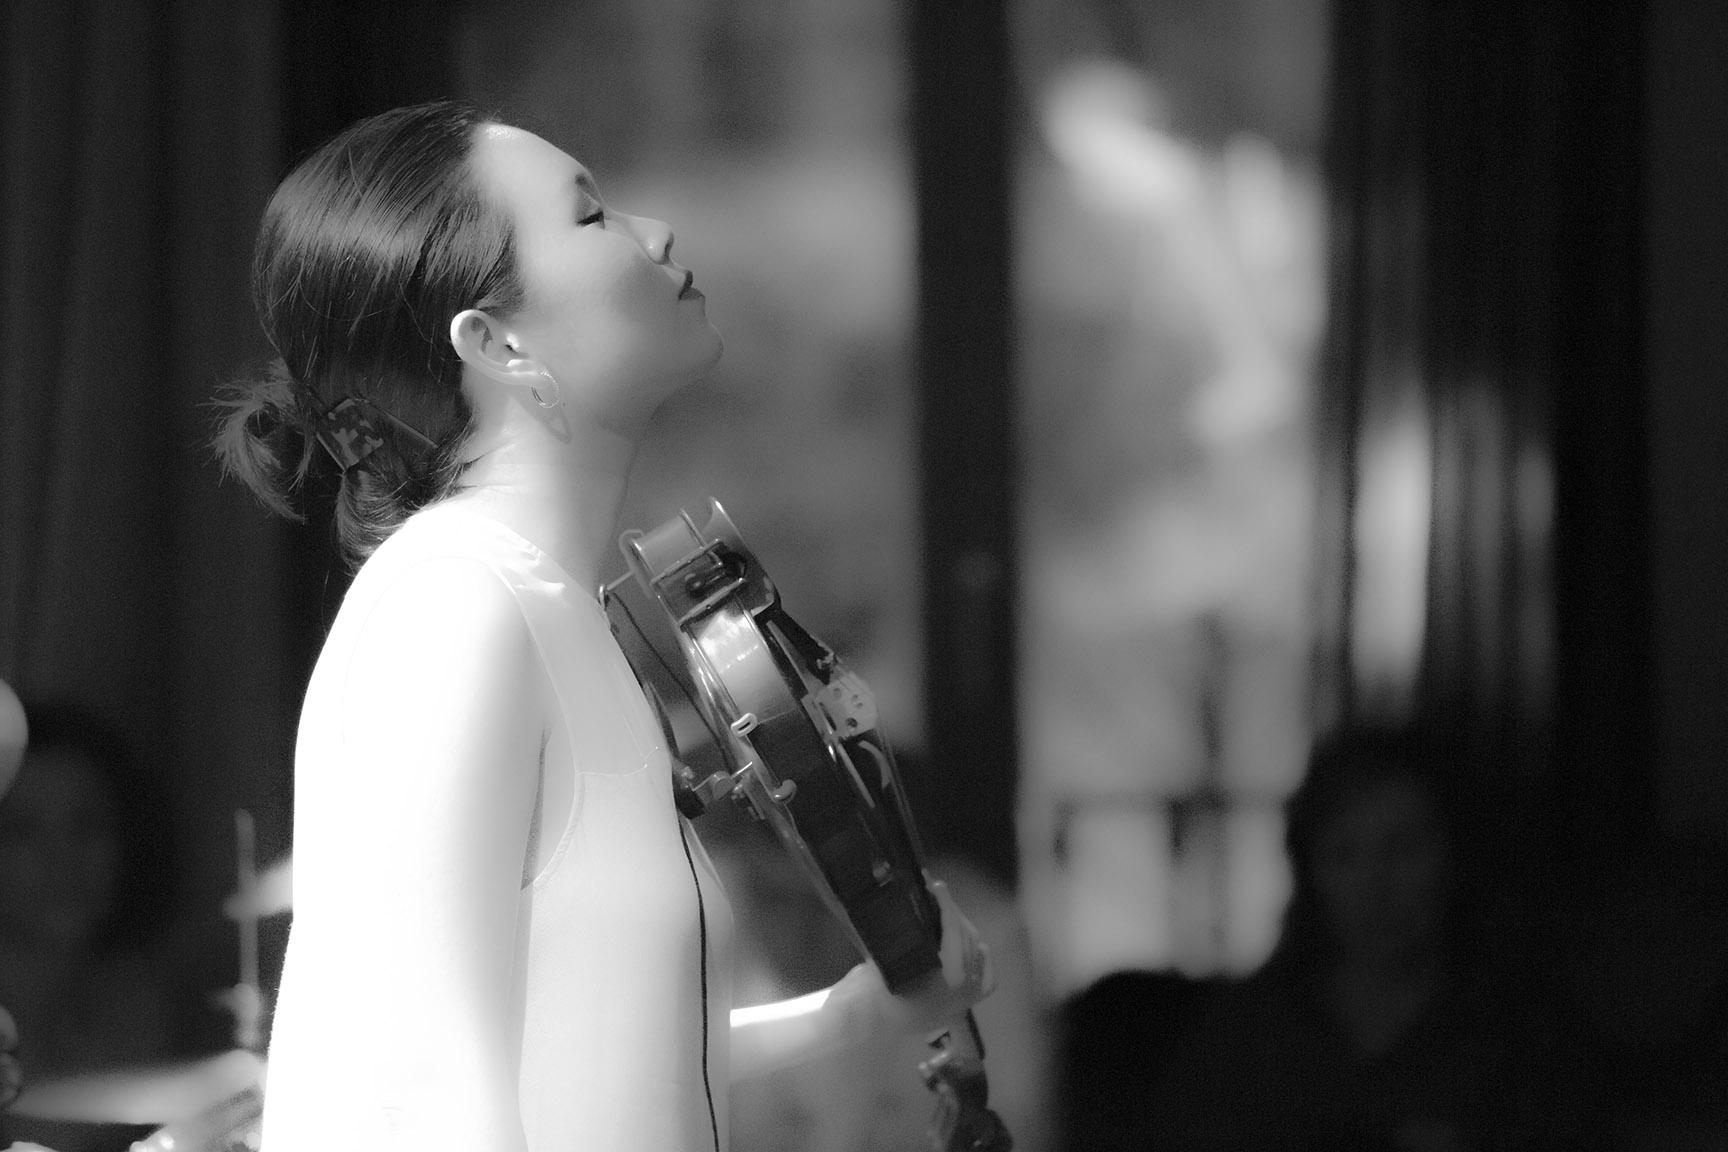 Festival de Jazz: MAUREEN CHOI @ Teatro de Colmenarejo